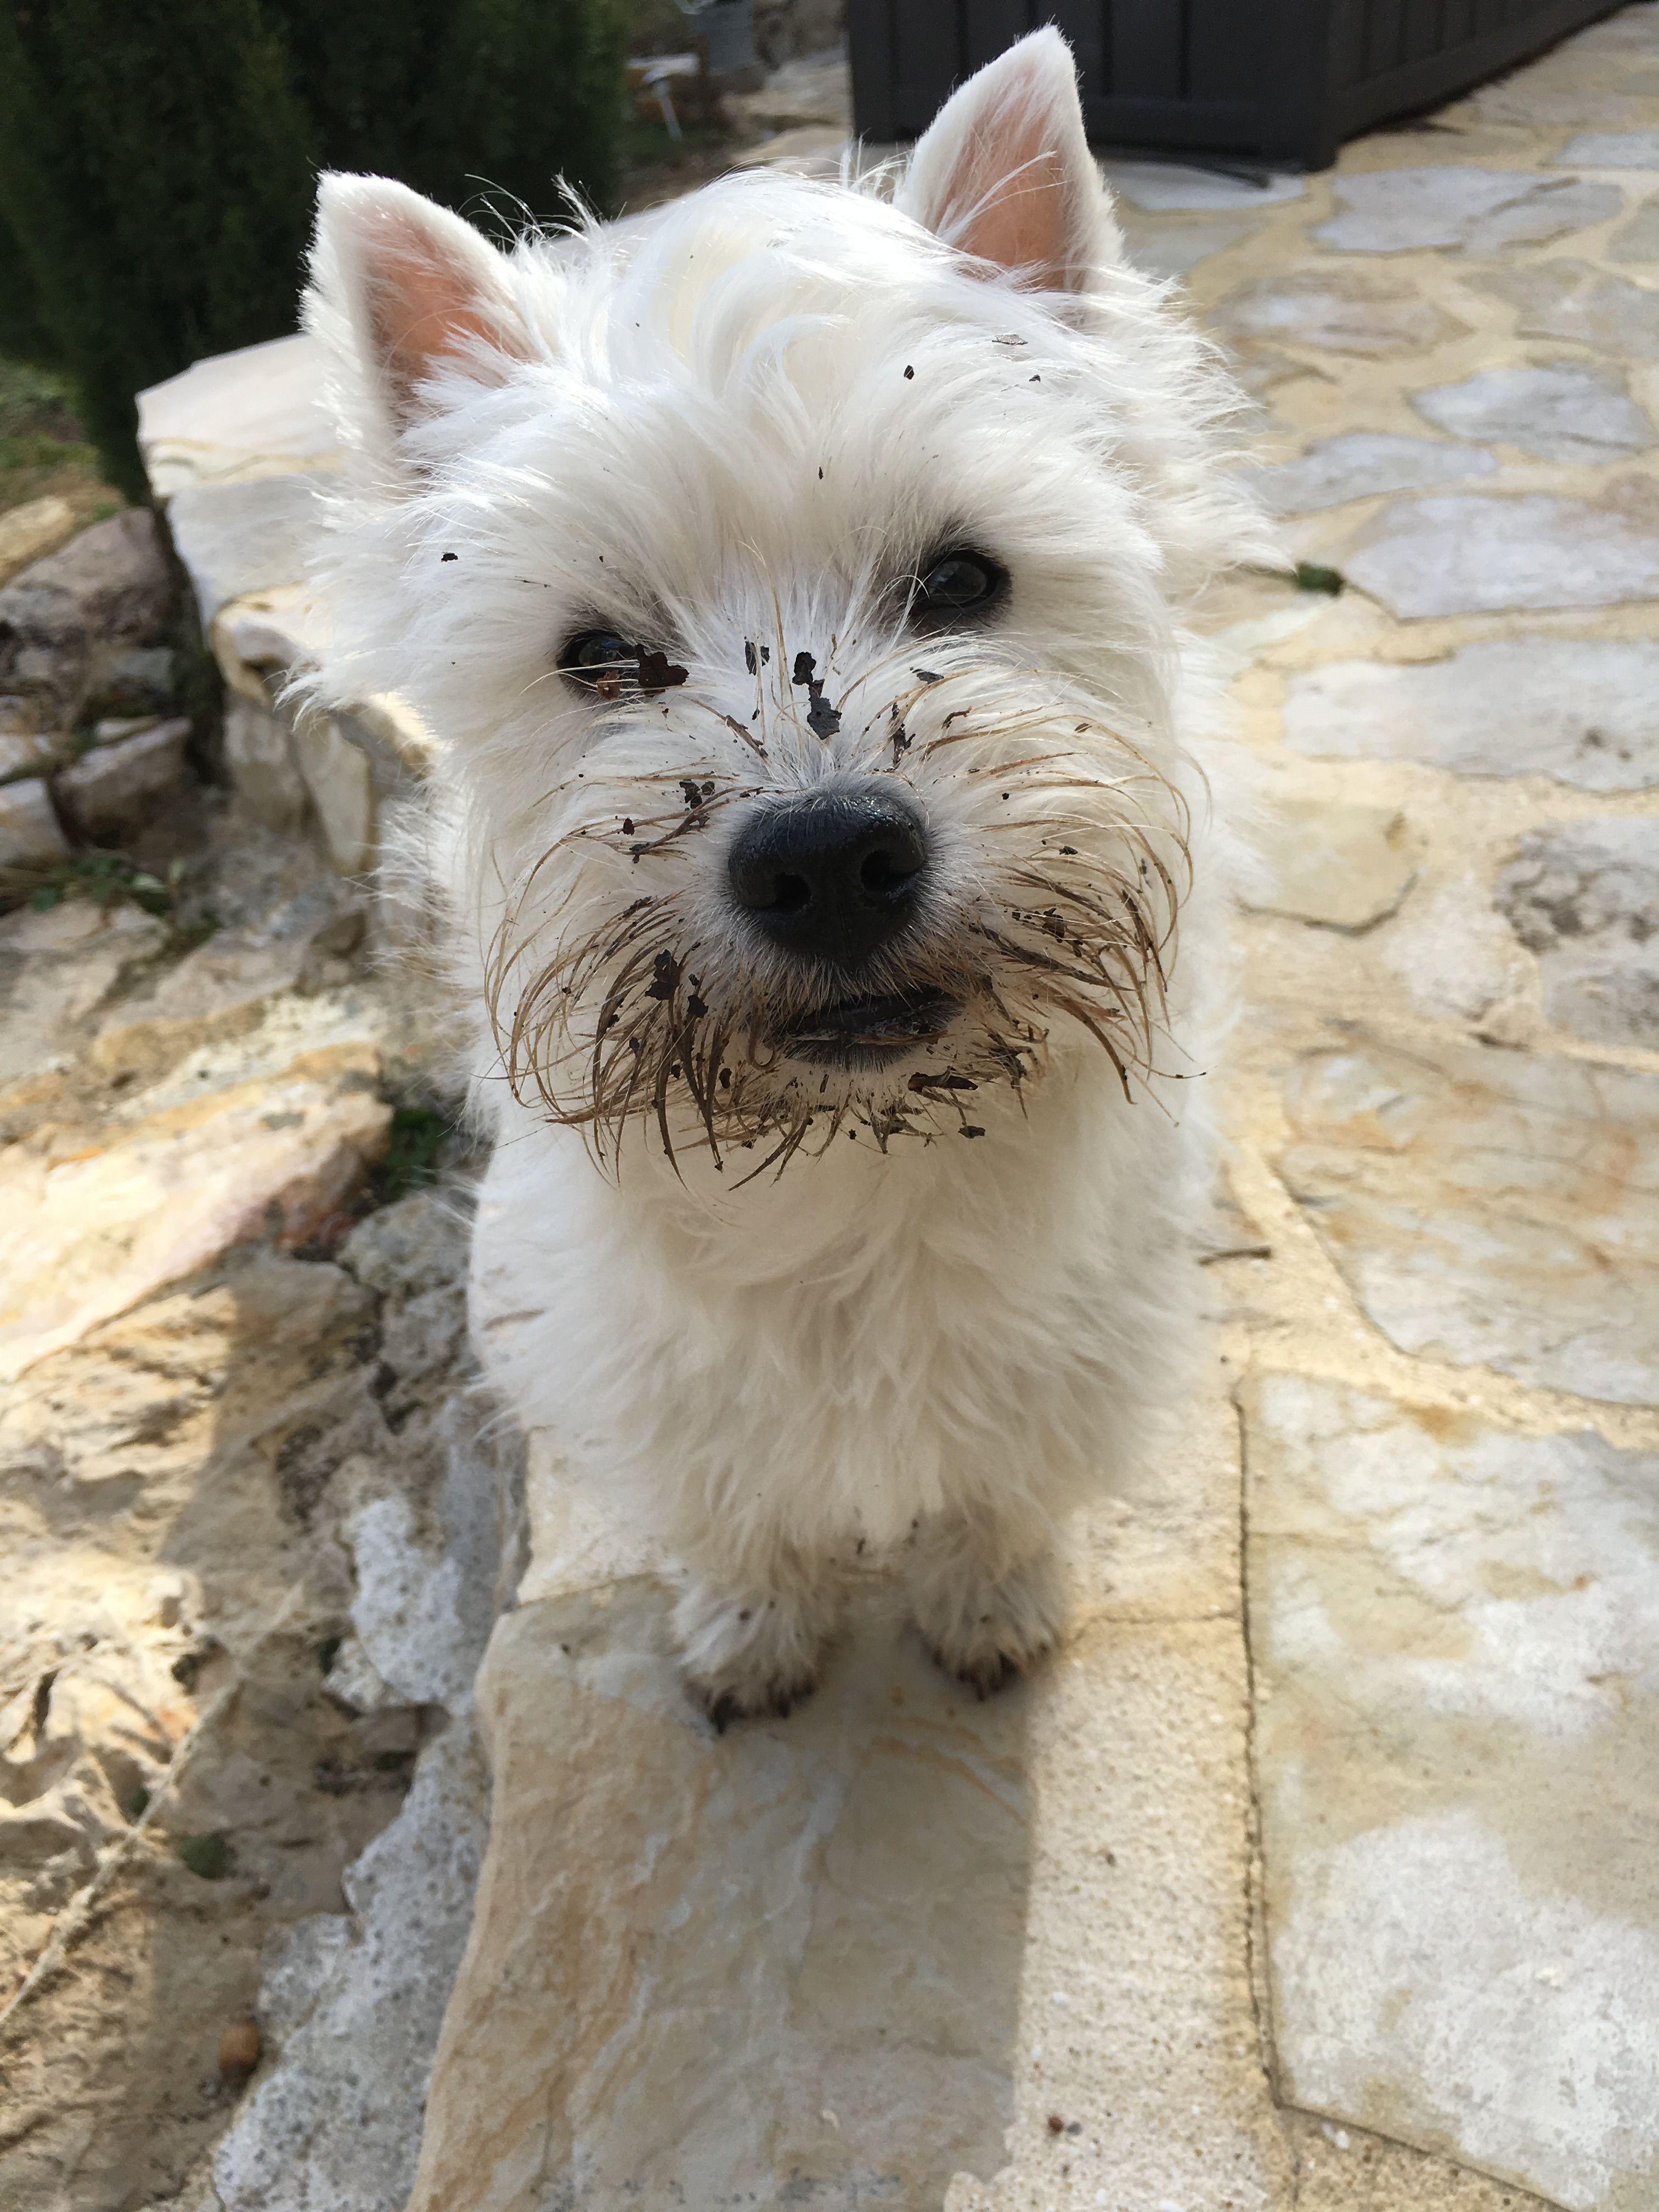 Pin By Jasper On Cute Little Shaggy Dogs West Highland